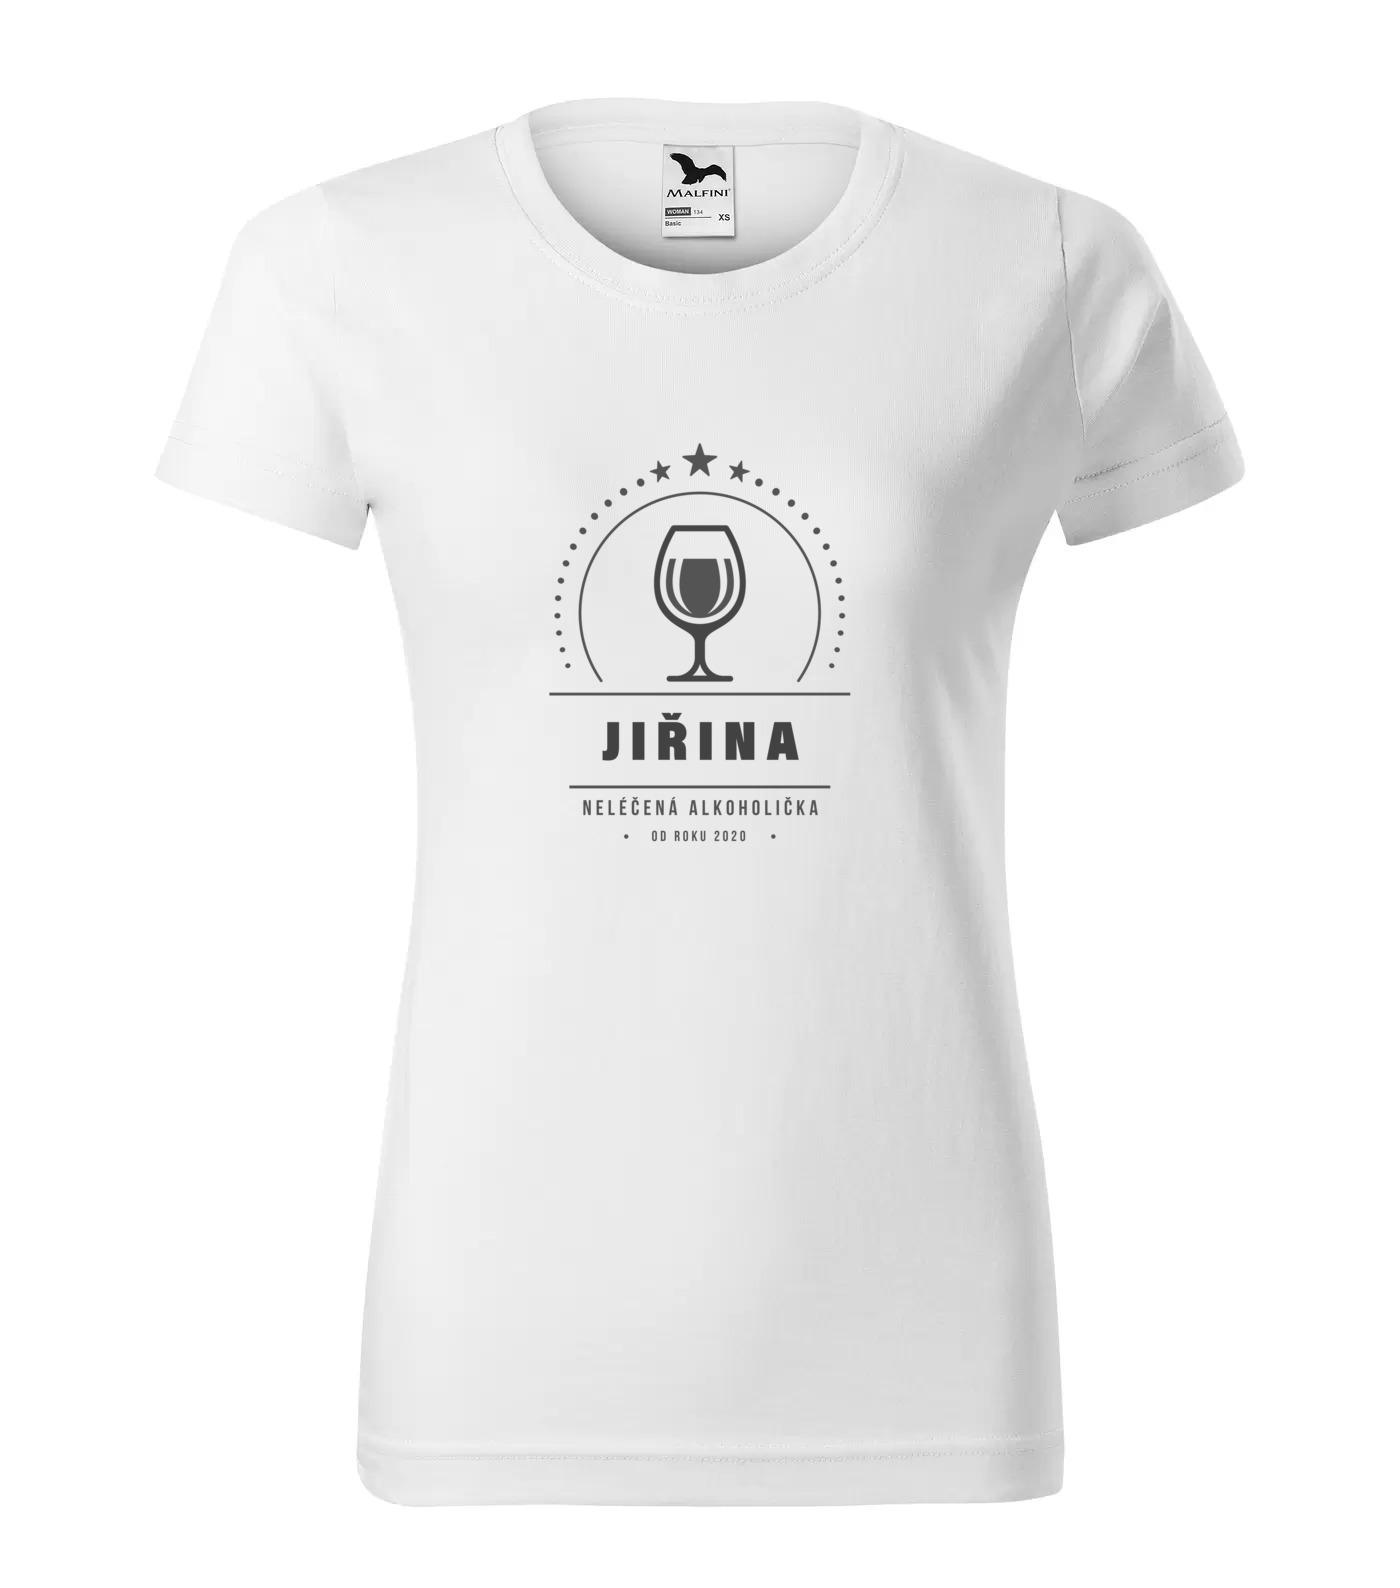 Tričko Alkoholička Jiřina